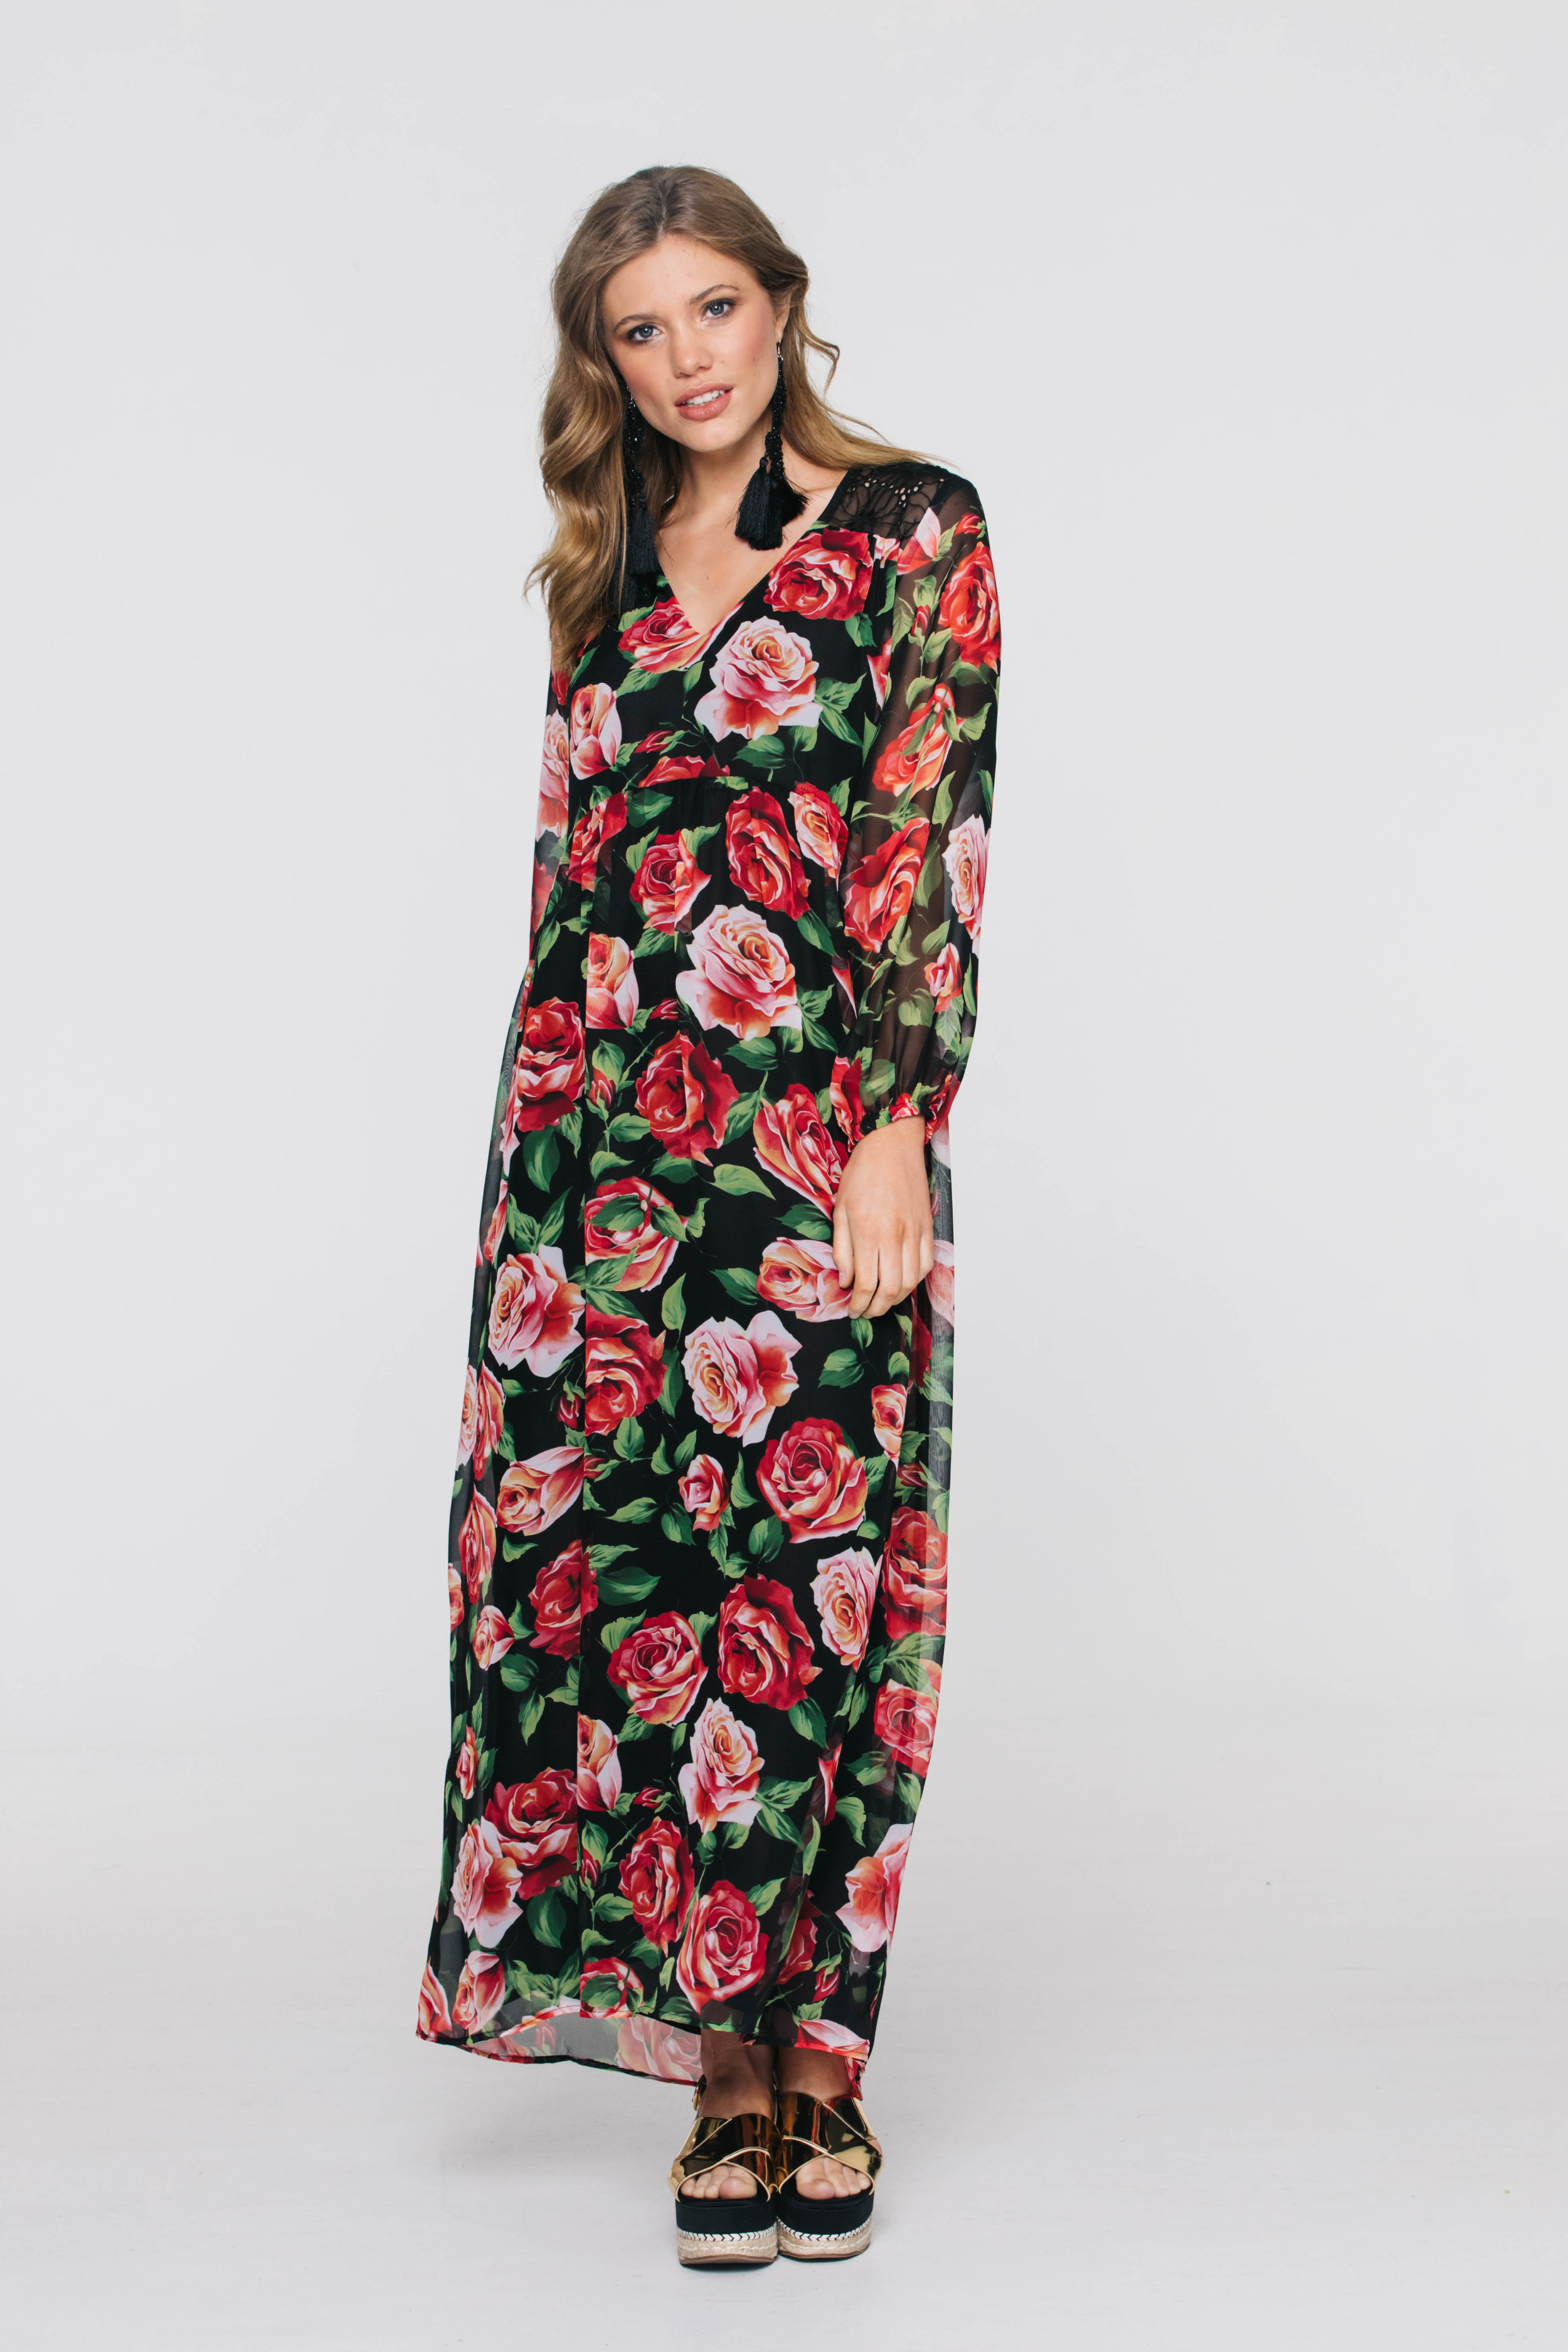 6272V Georgia Dress, Dolce Rose Chiffon Black